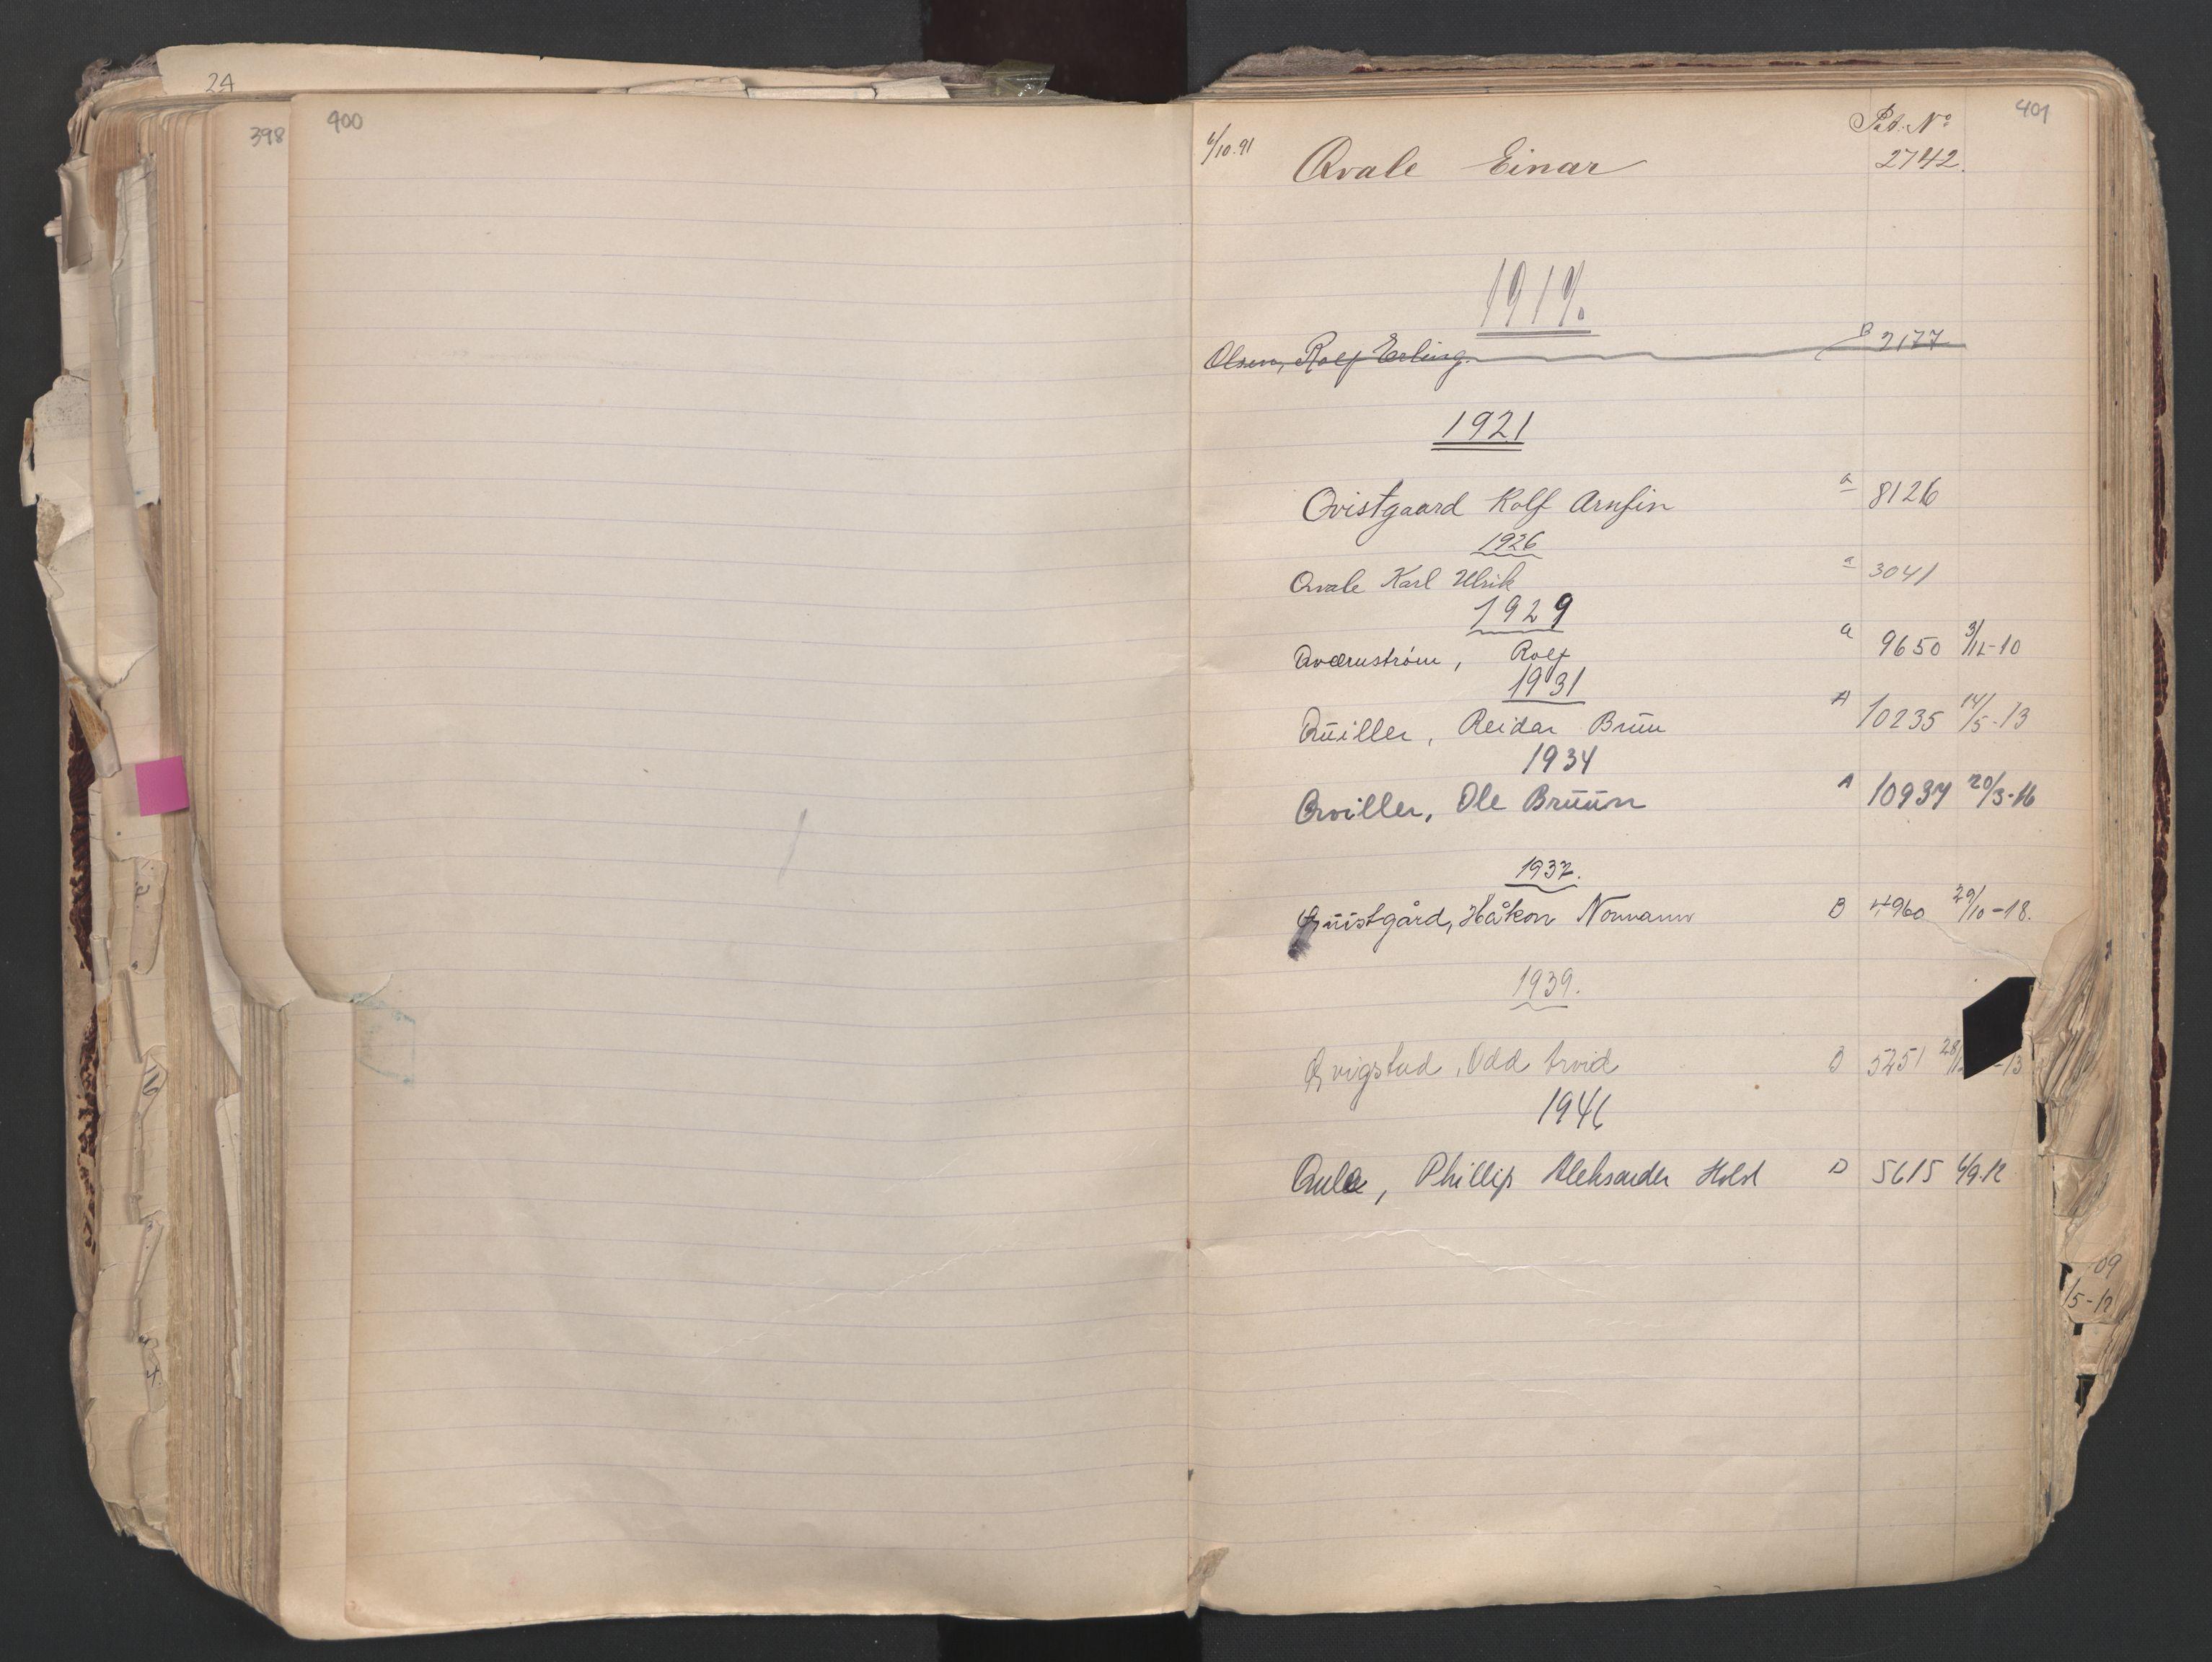 SAO, Oslo sjømannskontor, F/Fa/L0003: Register for Oslo mønstringskrets, 1891-1948, s. 400-401